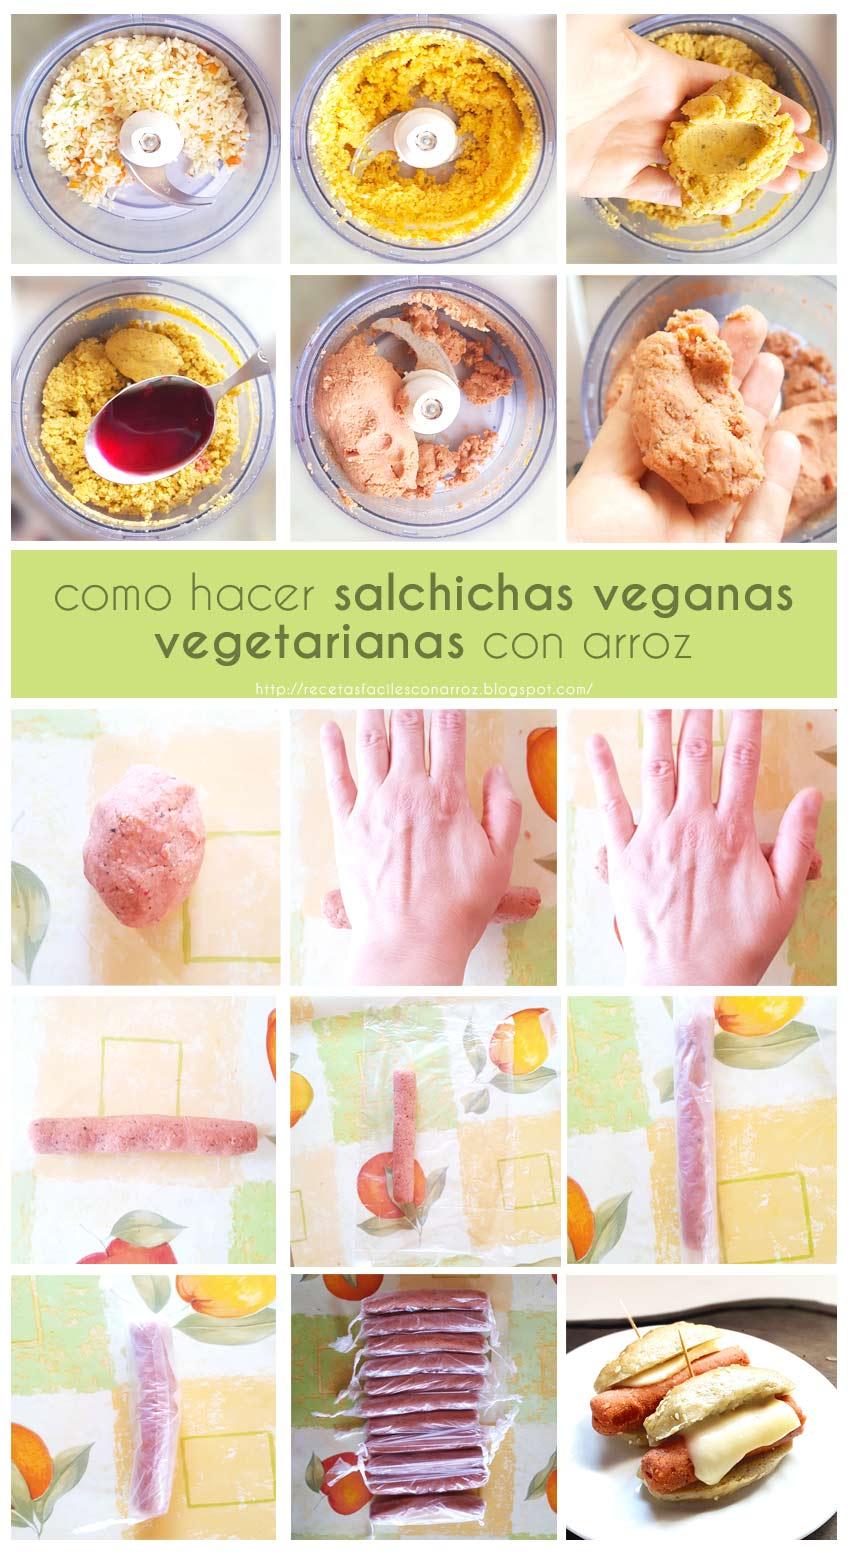 salchicha vegana vegetariana arroz fototutorial